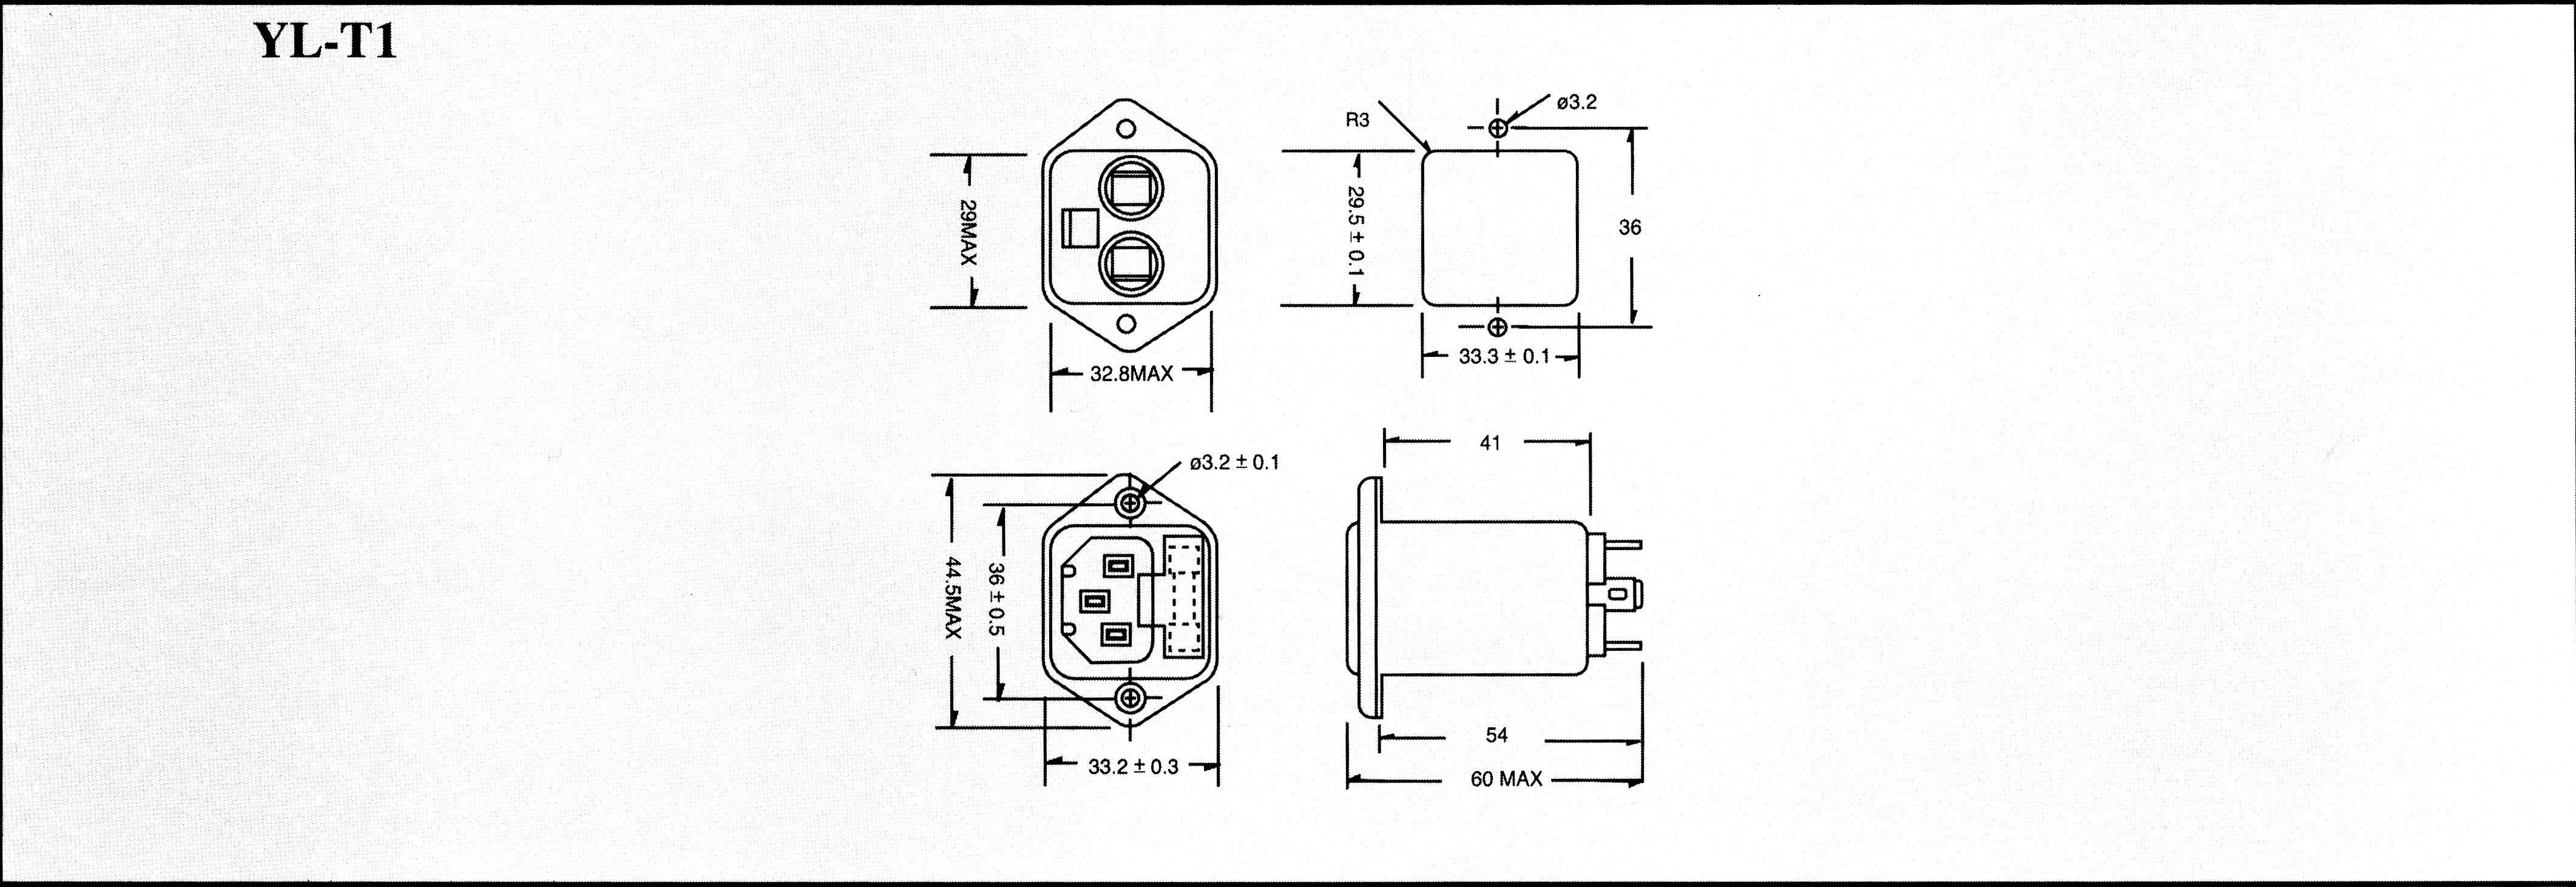 Síťový filtr Yunpen YL06T1, 2 x 0,7 mH, 125/250 V/AC, (50/60 Hz), 6 A